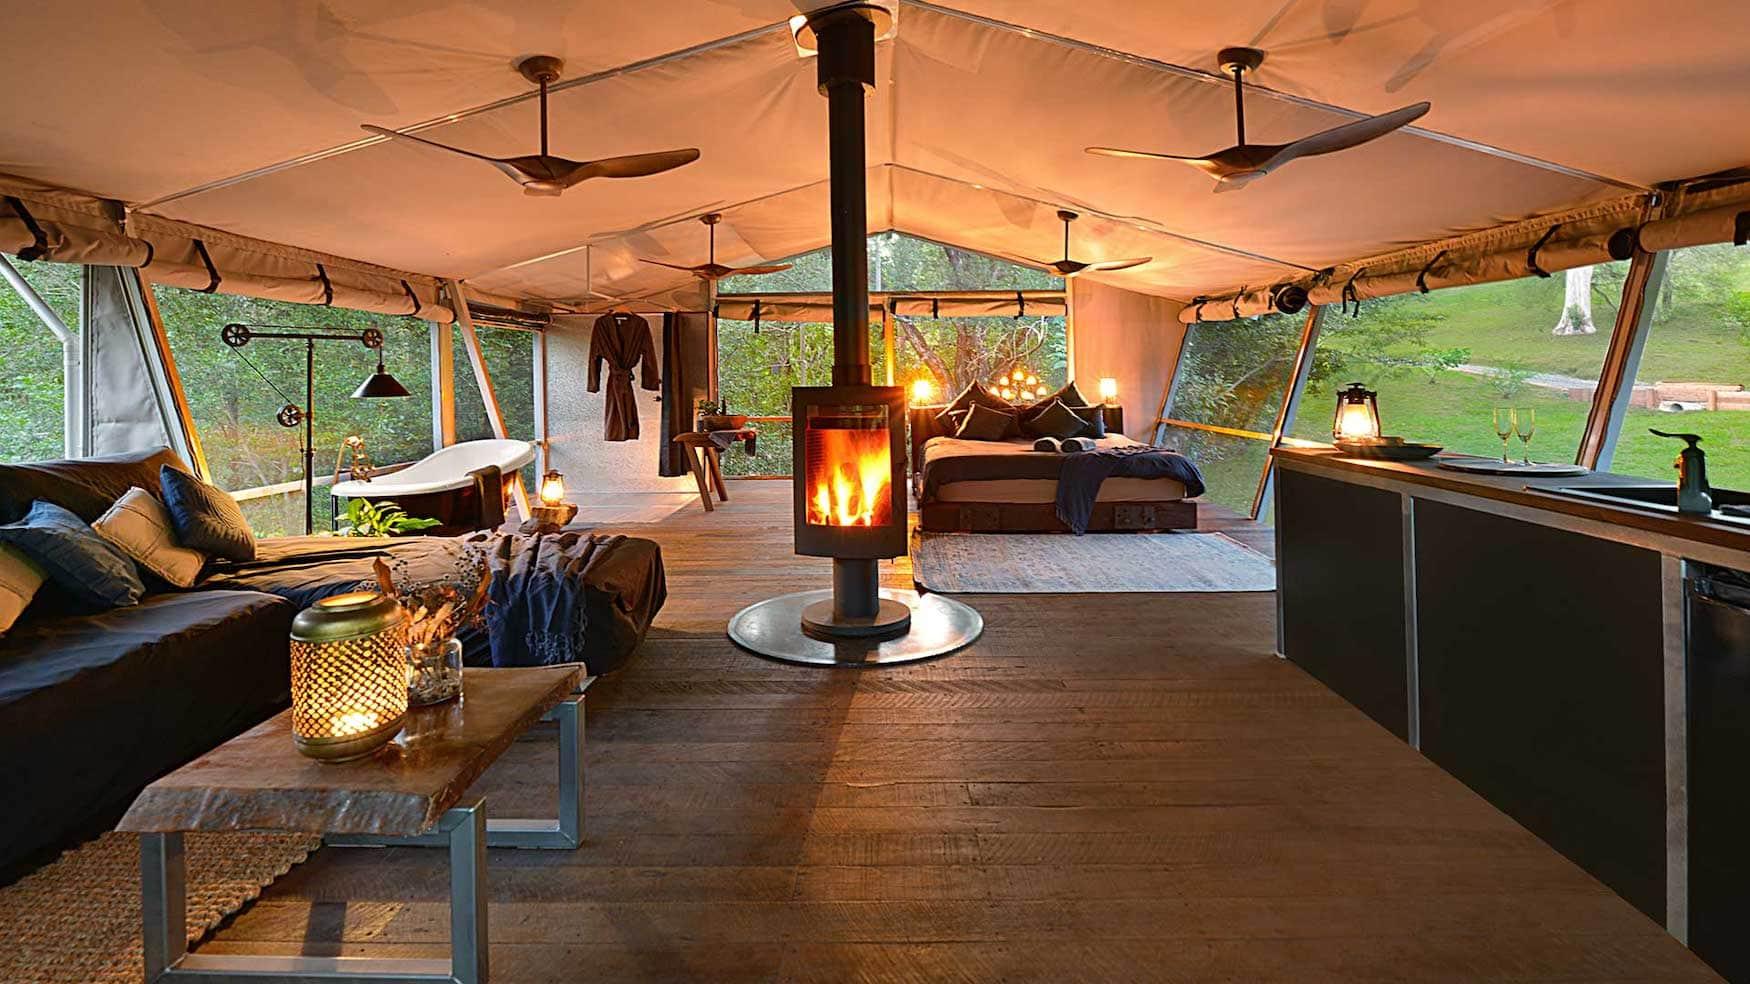 Luxuriöses Glamping in Australien, das Starry Nights Luxury Camping